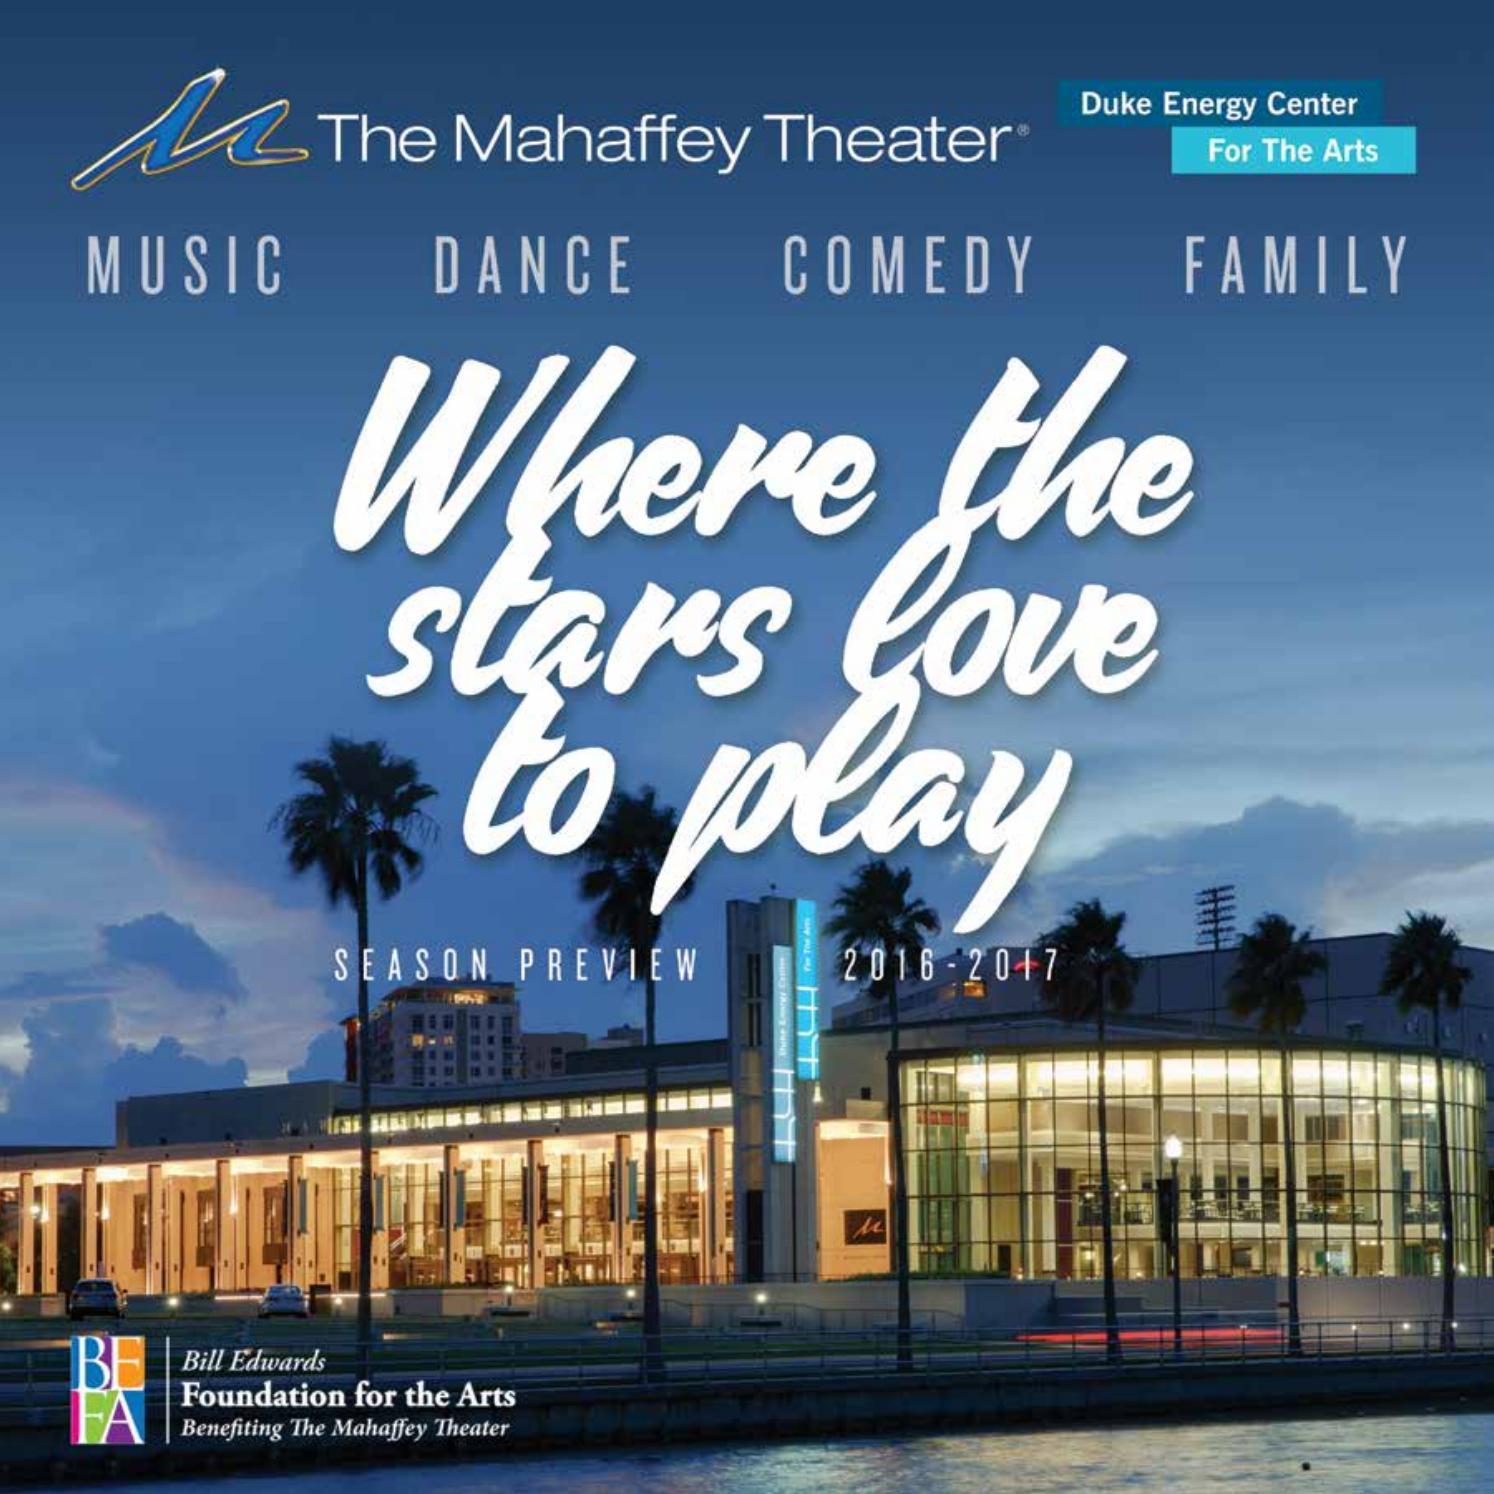 Mahaffey Theater Season 2016-2017 Preview by Mahaffey Theater - issuu